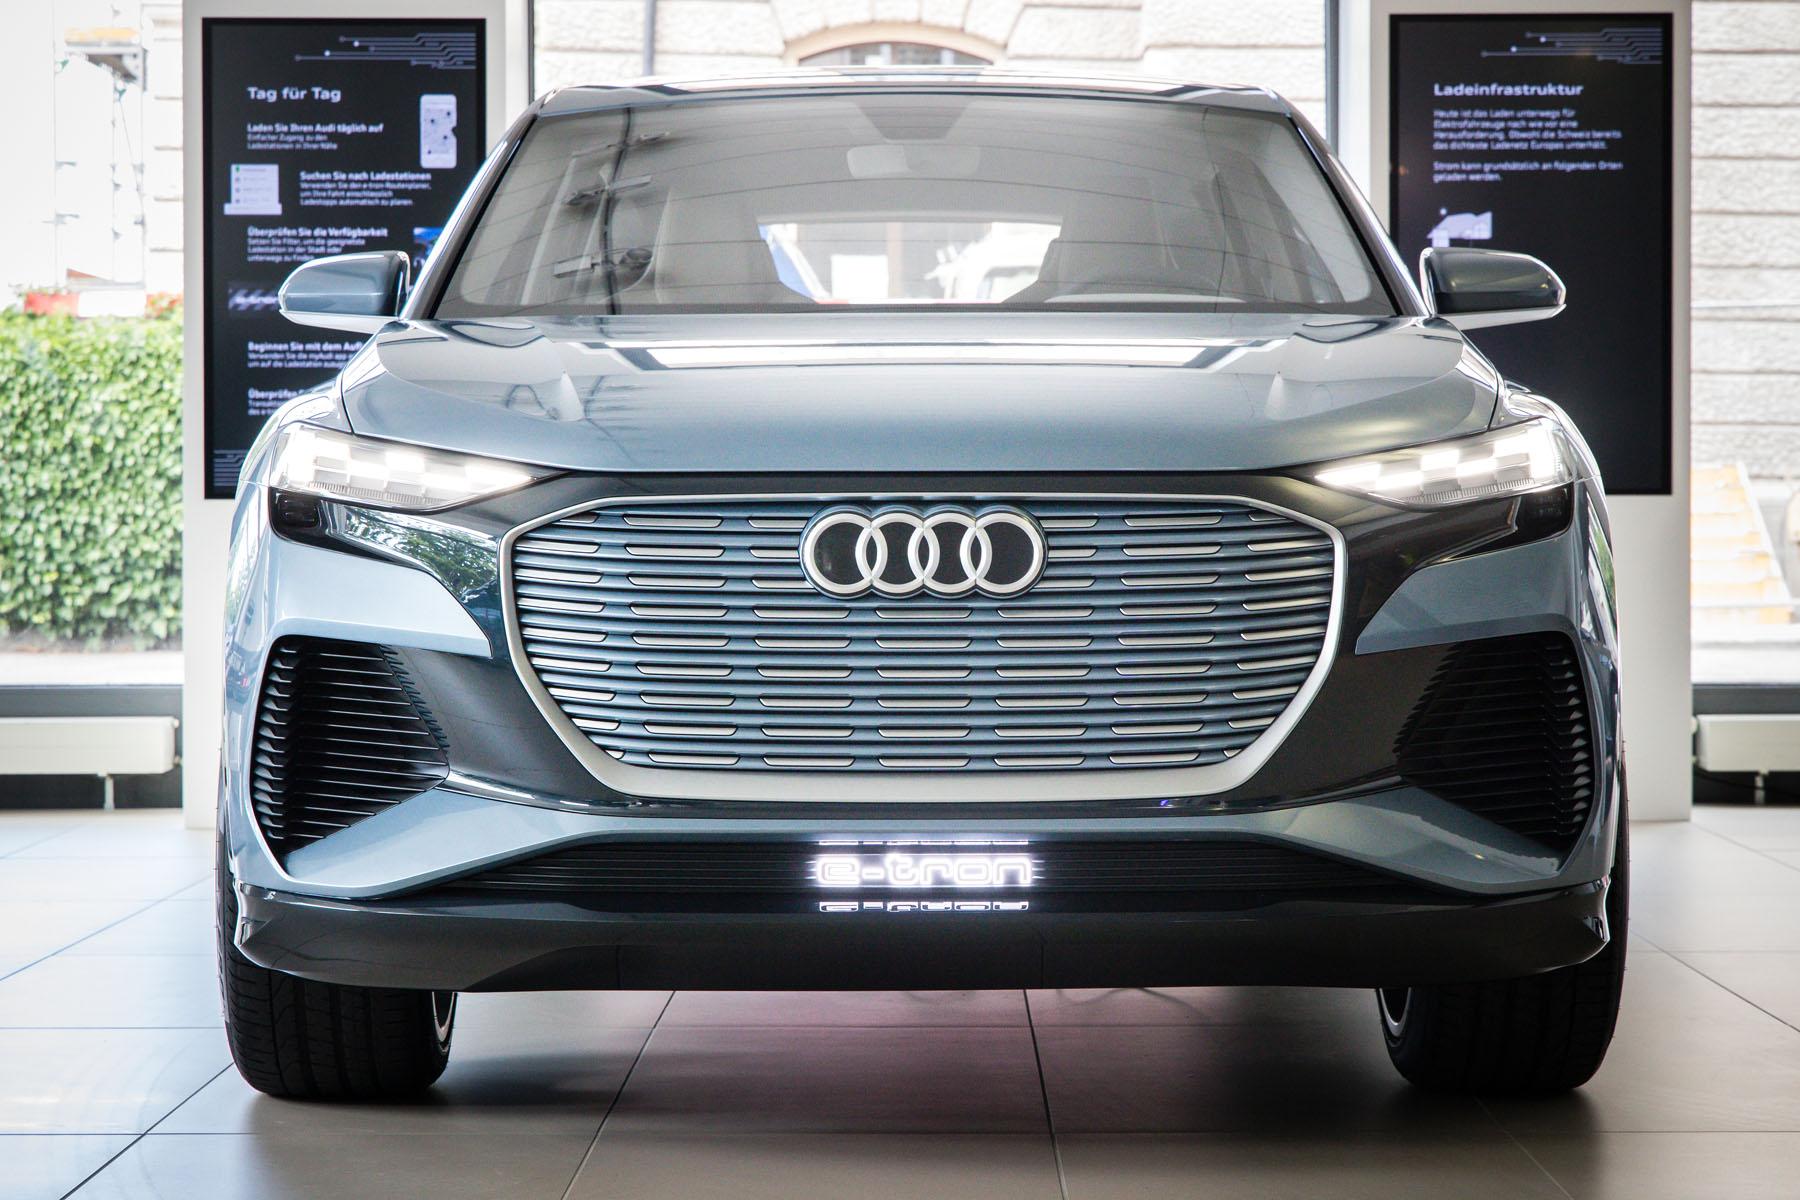 Impressionen aus dem Audi e-tron experience center am Utoquai 47 in Zürich.